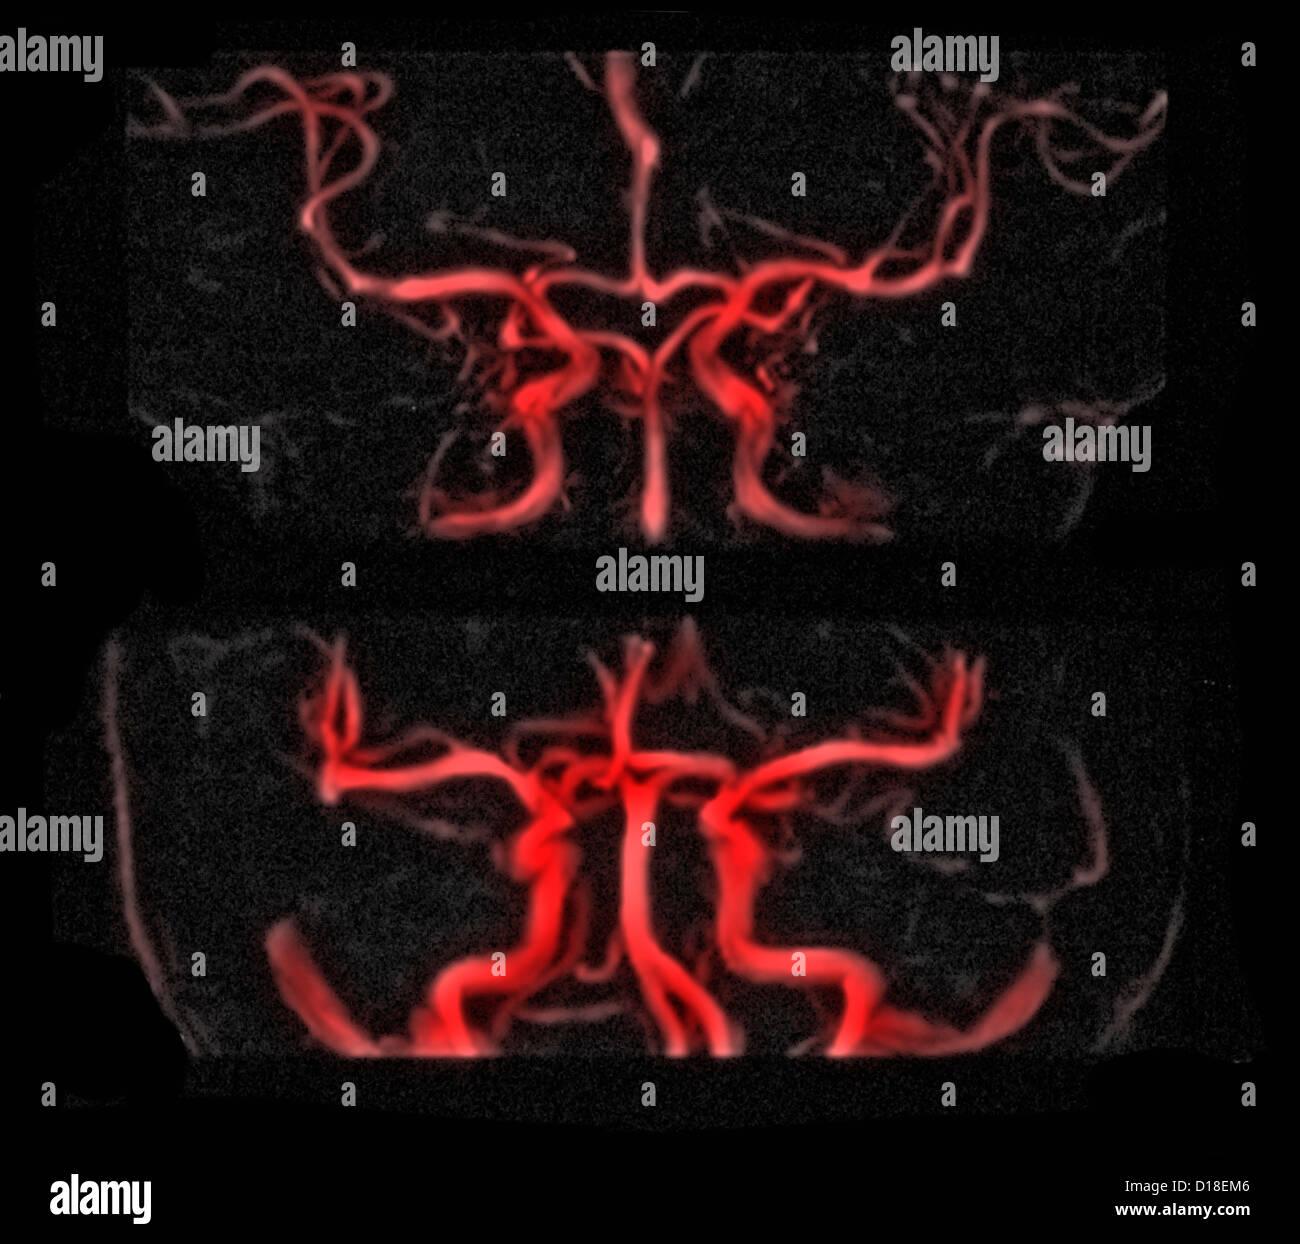 MRI vascular brain radiograph, gadolinium contrast - Stock Image